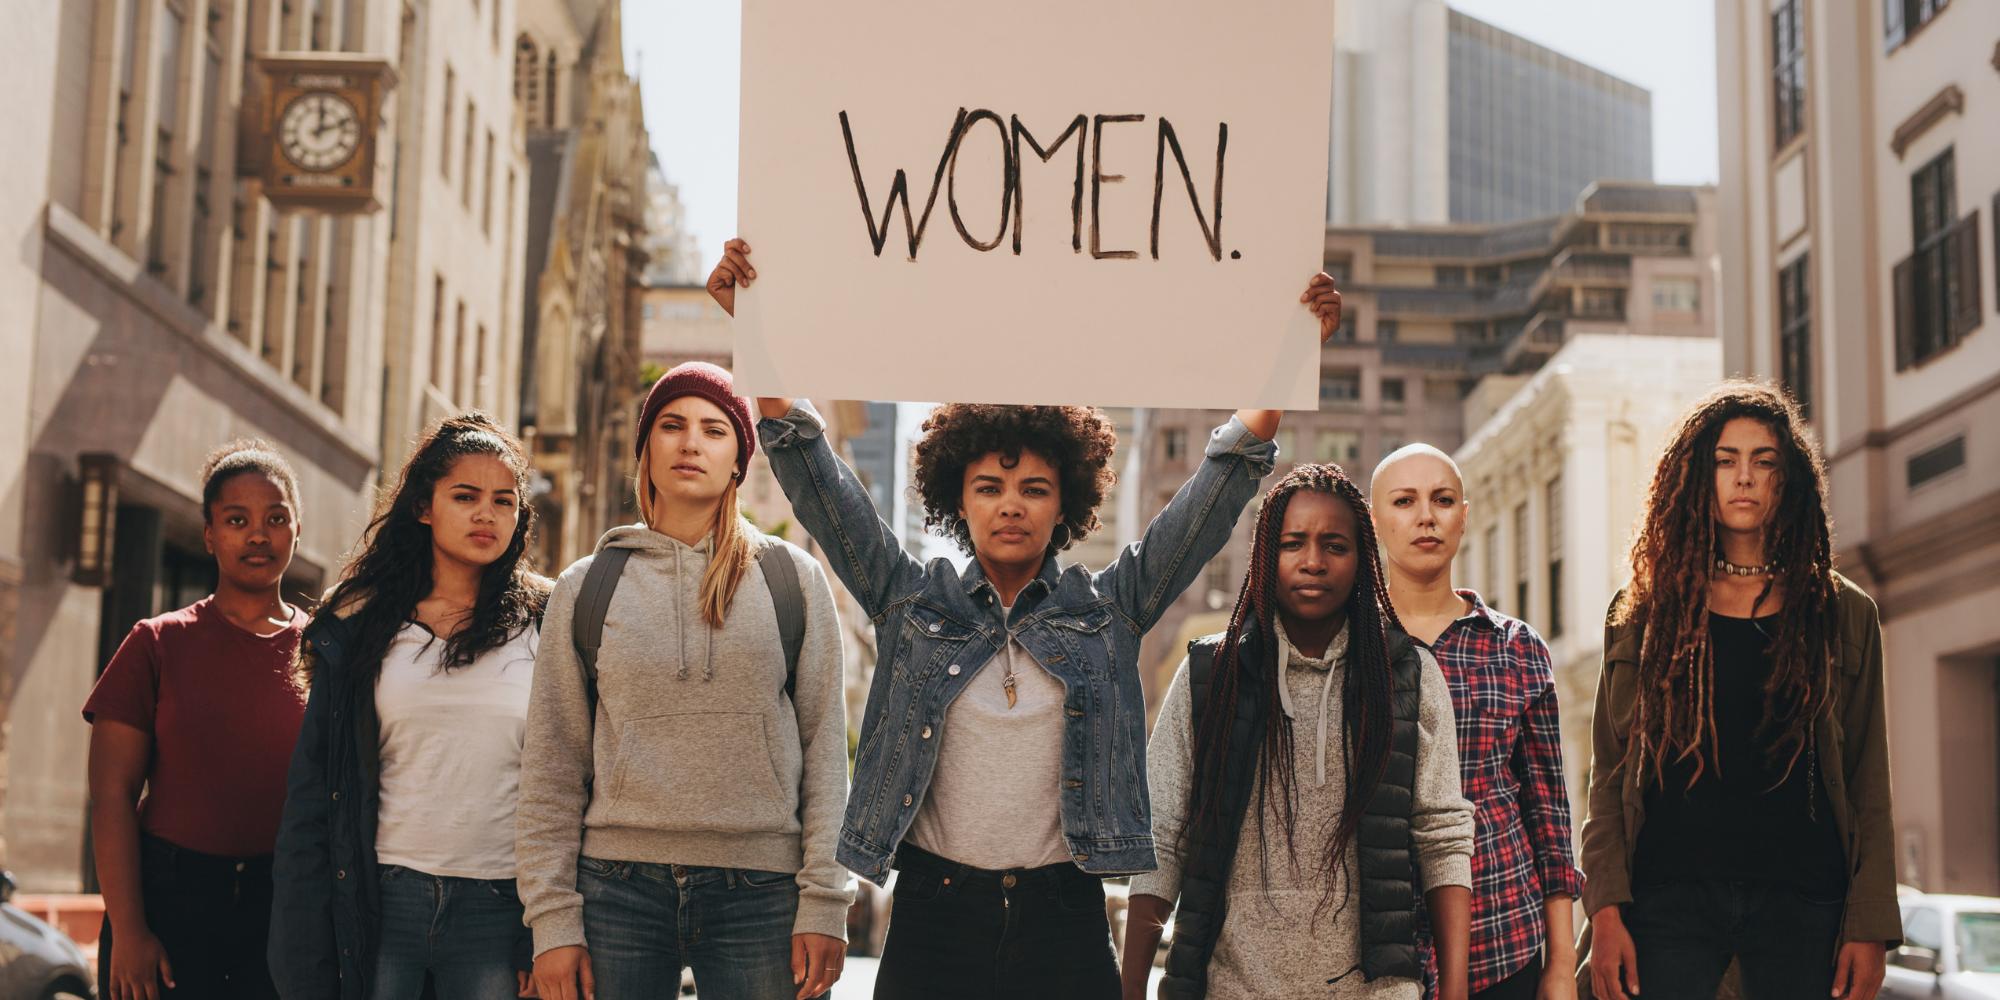 Women's herstory in the making